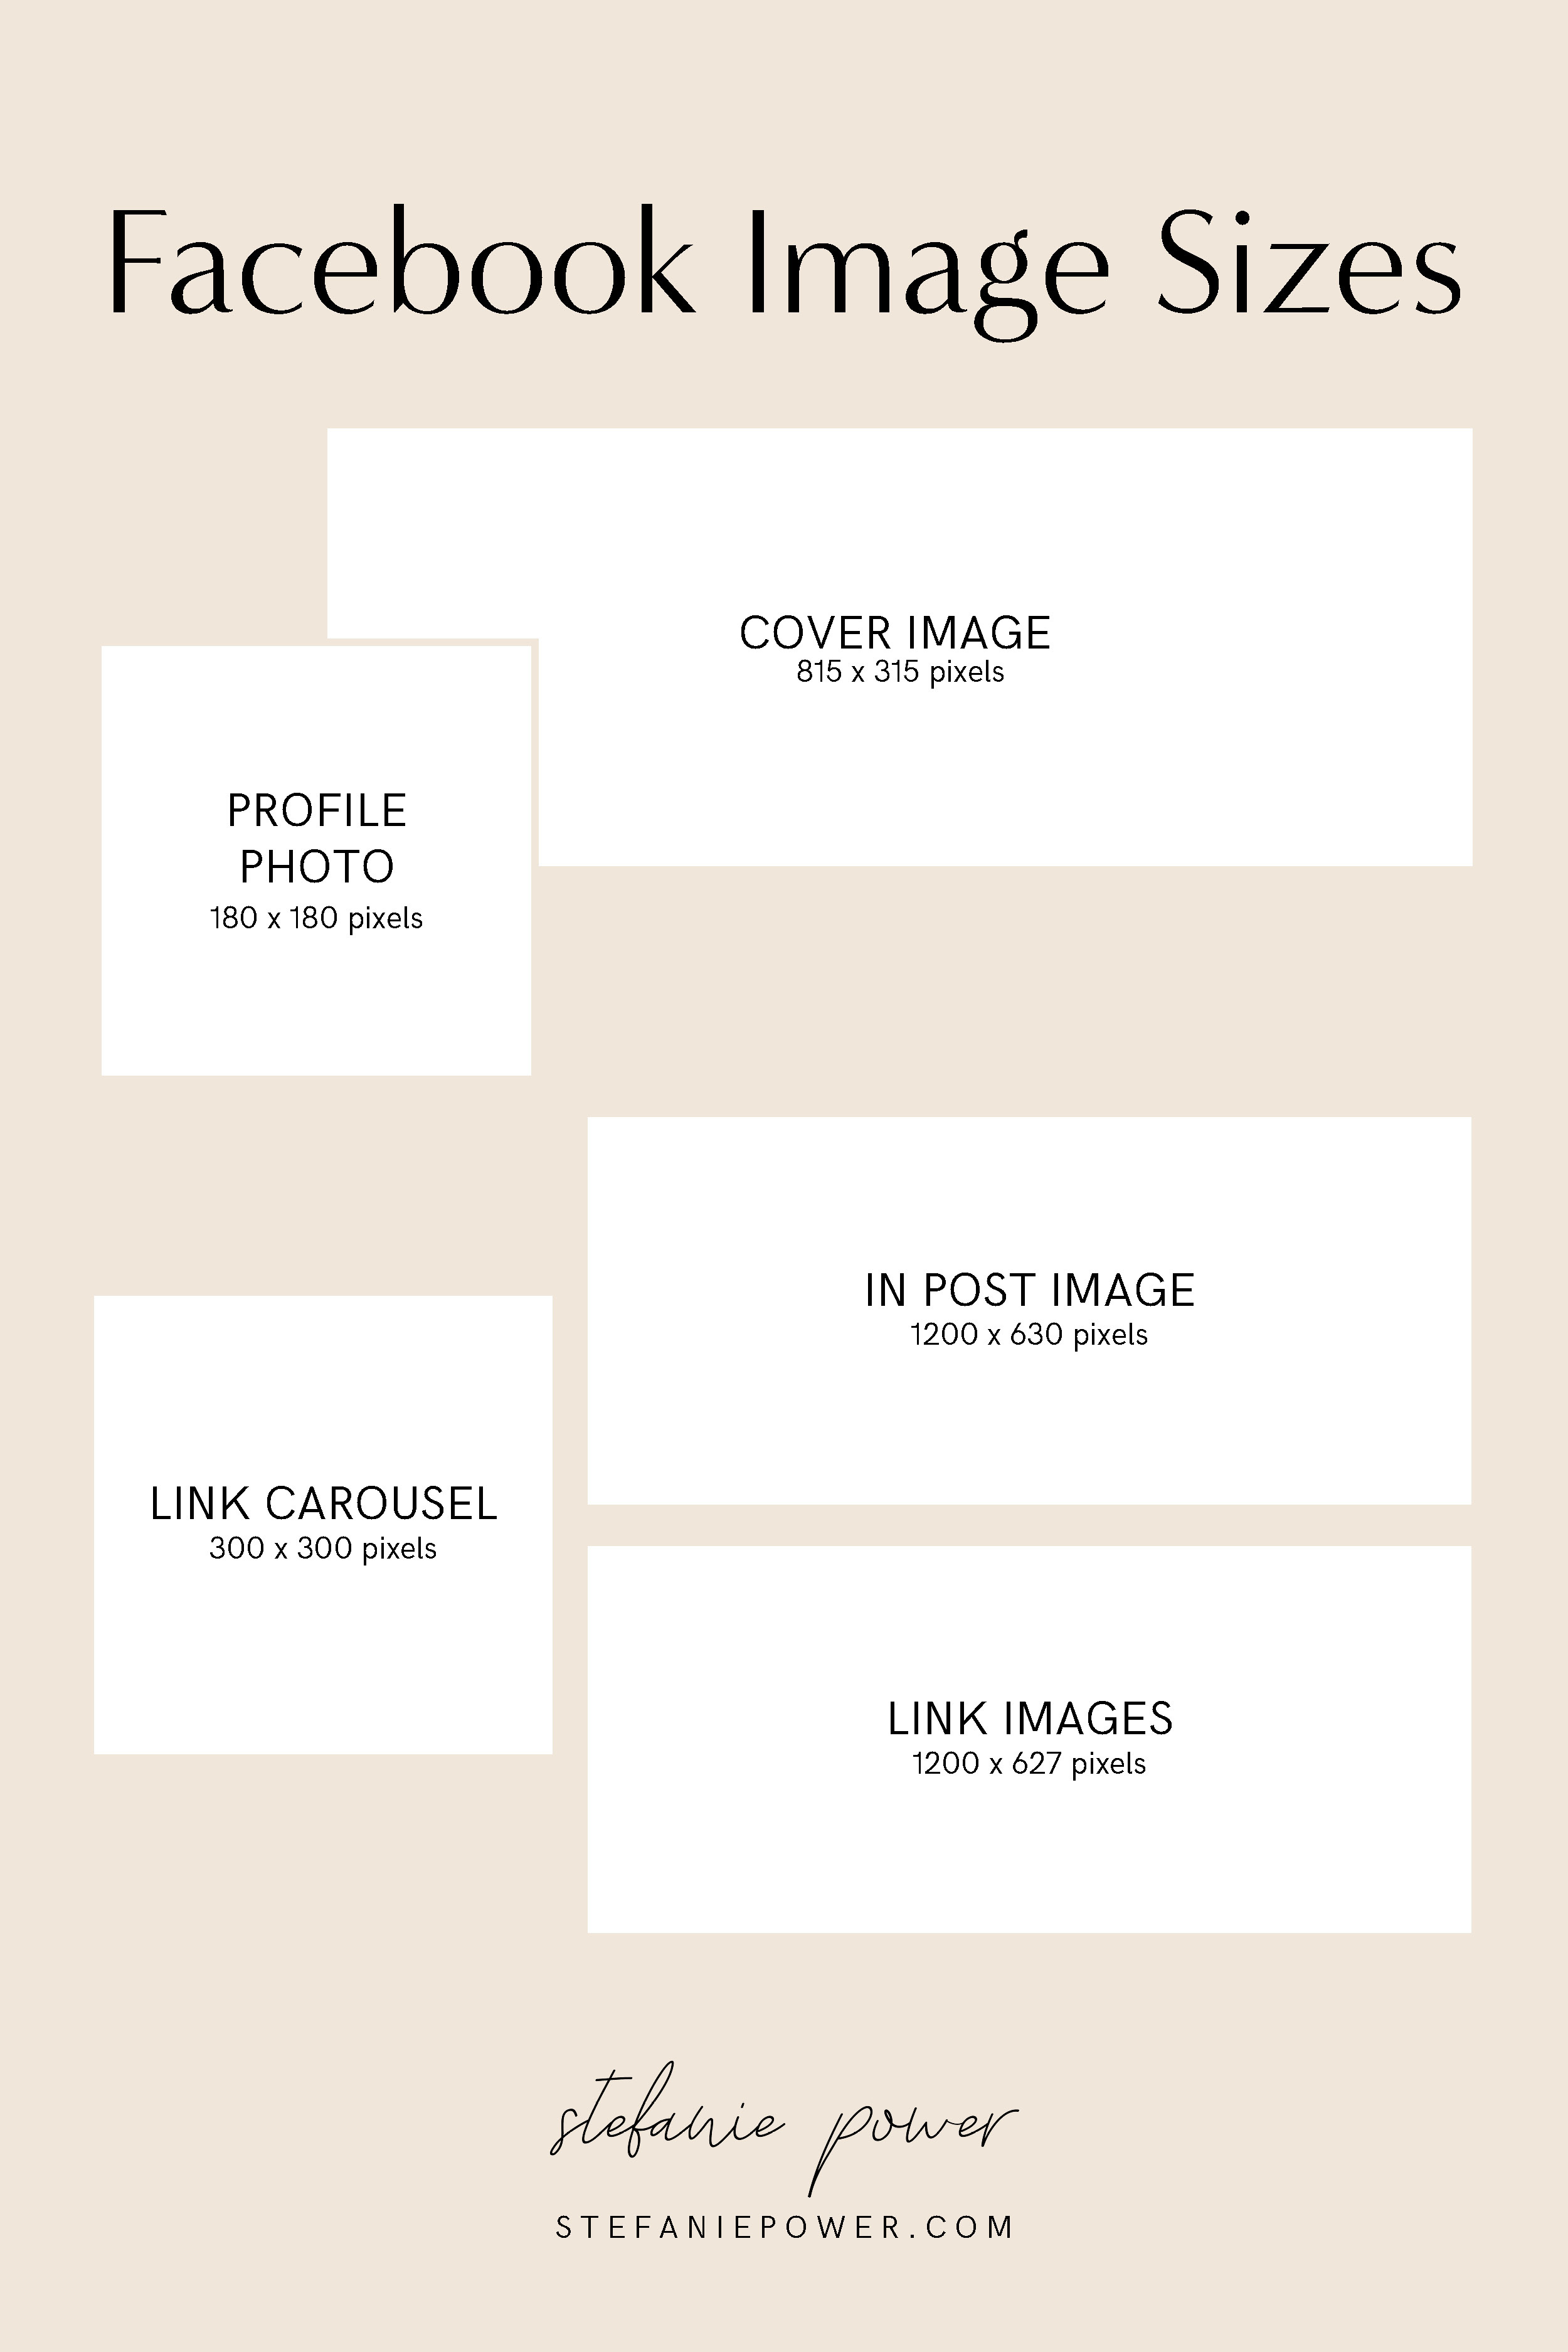 2019 Social Media Image Size Guide for Pinterest, Facebook, Instagram, Twitter and Youtube. | stefaniepower.com